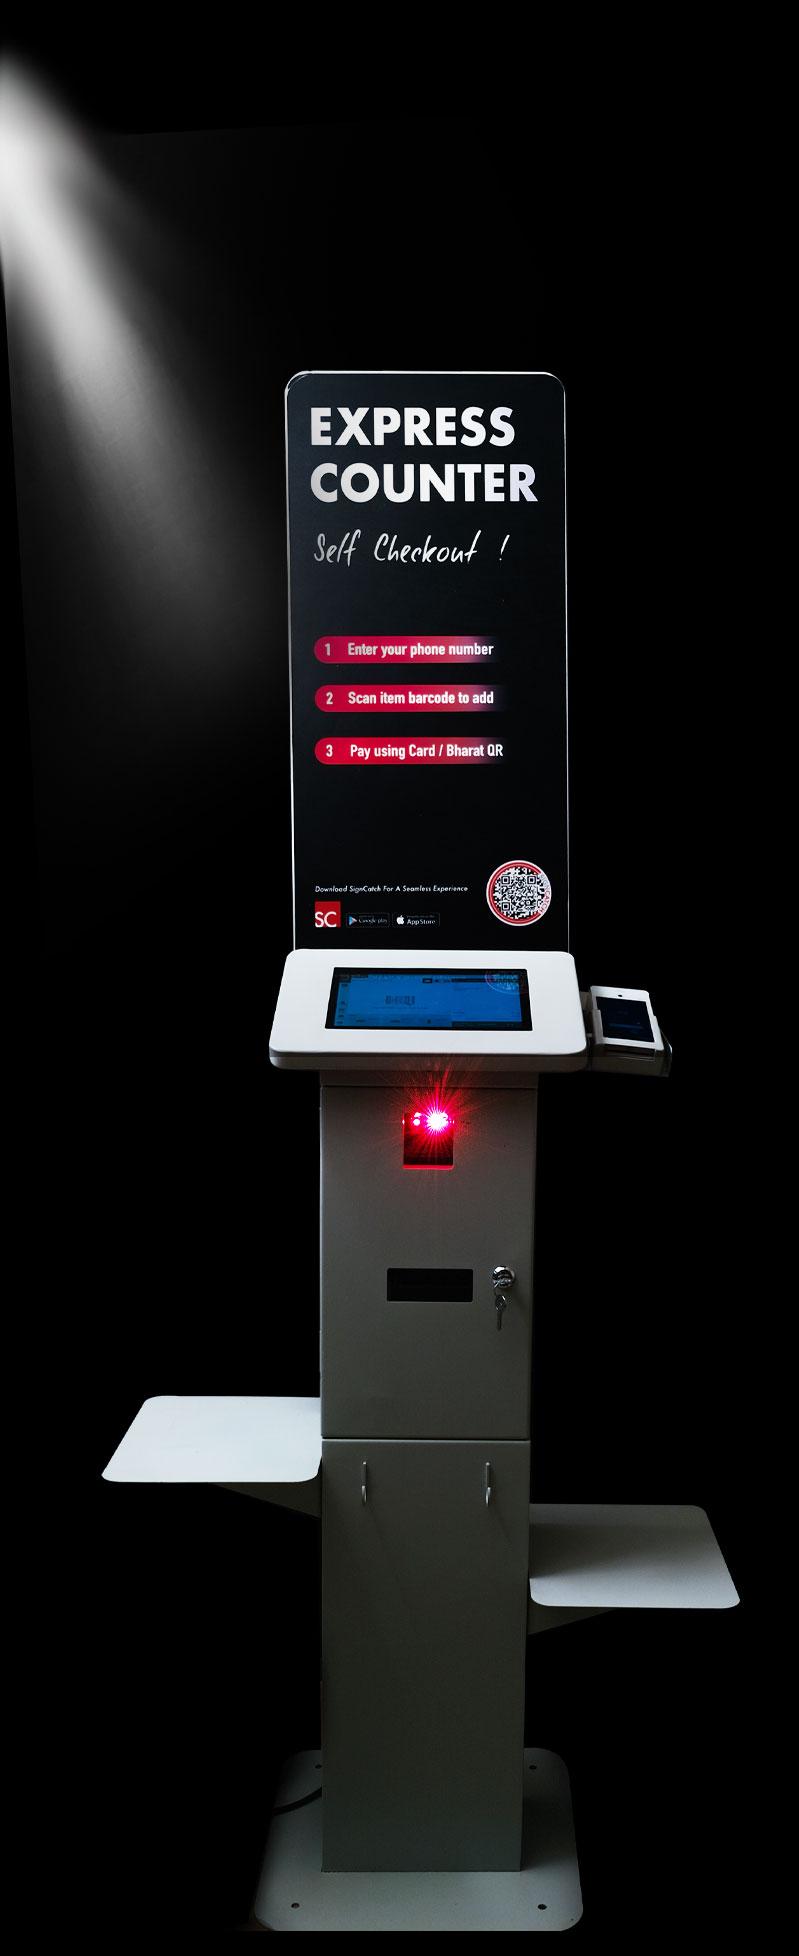 self-checkout kiosk machine in india